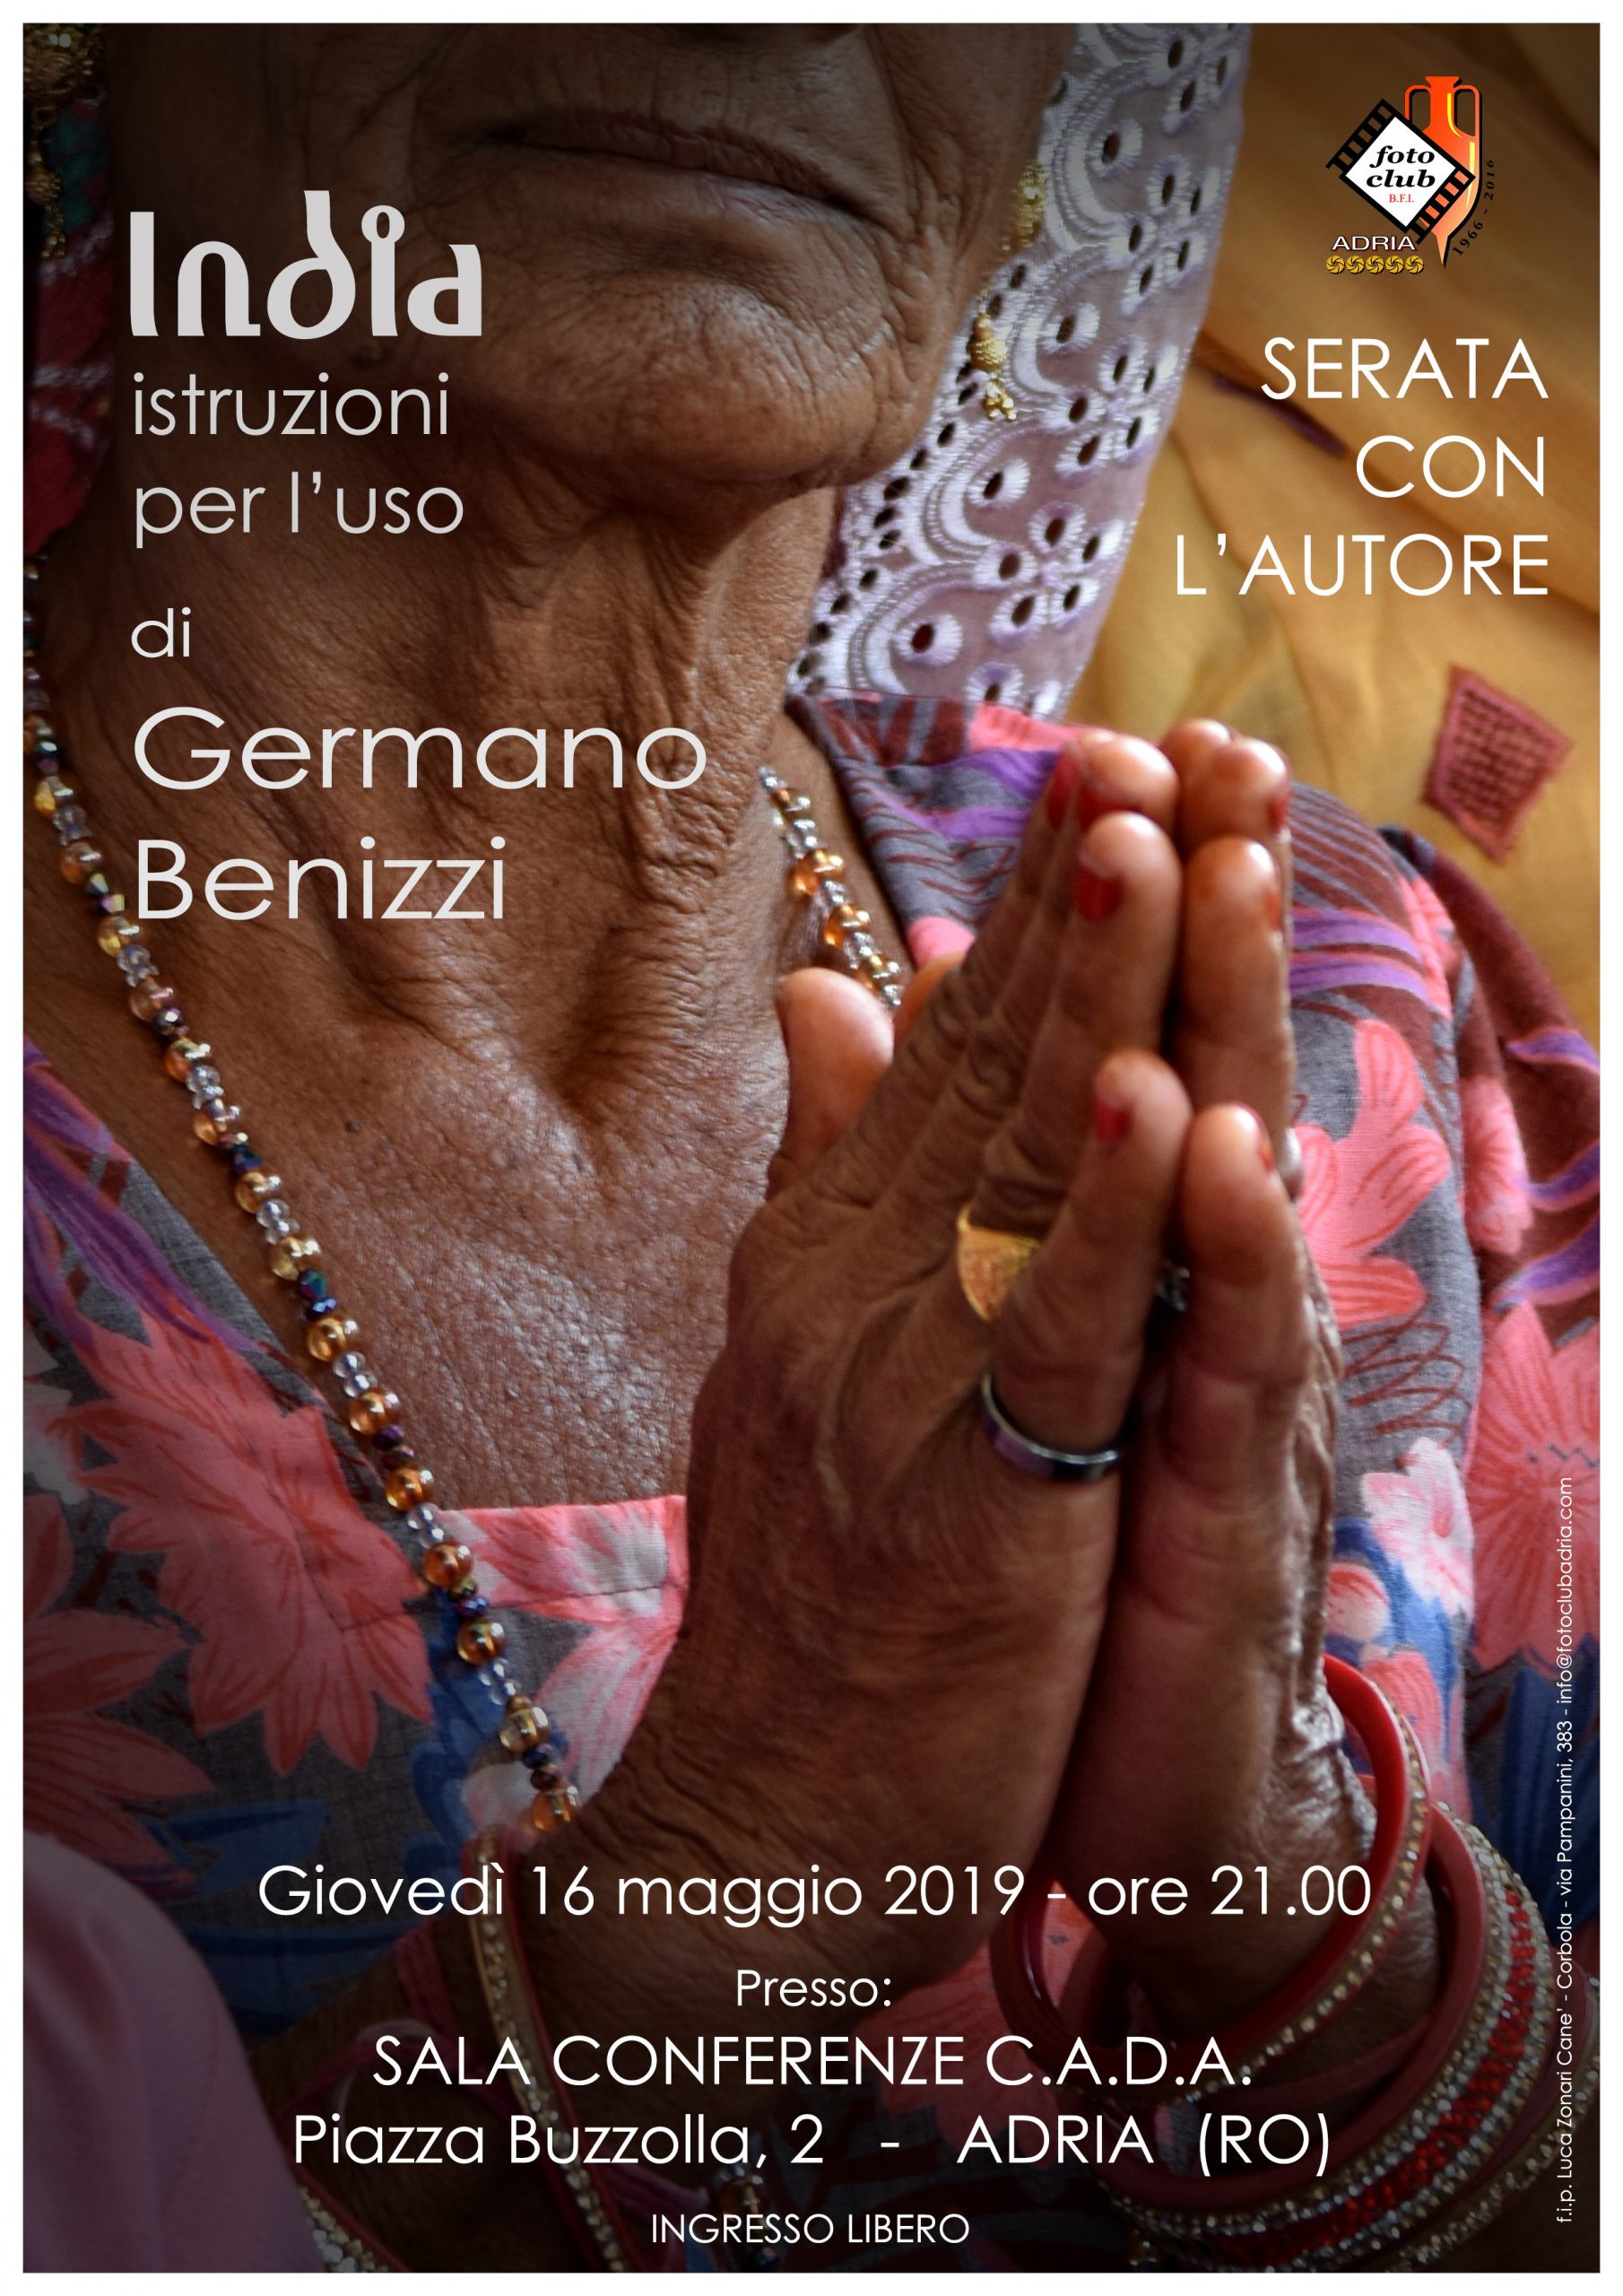 2019-05-16 Germano Benizzi